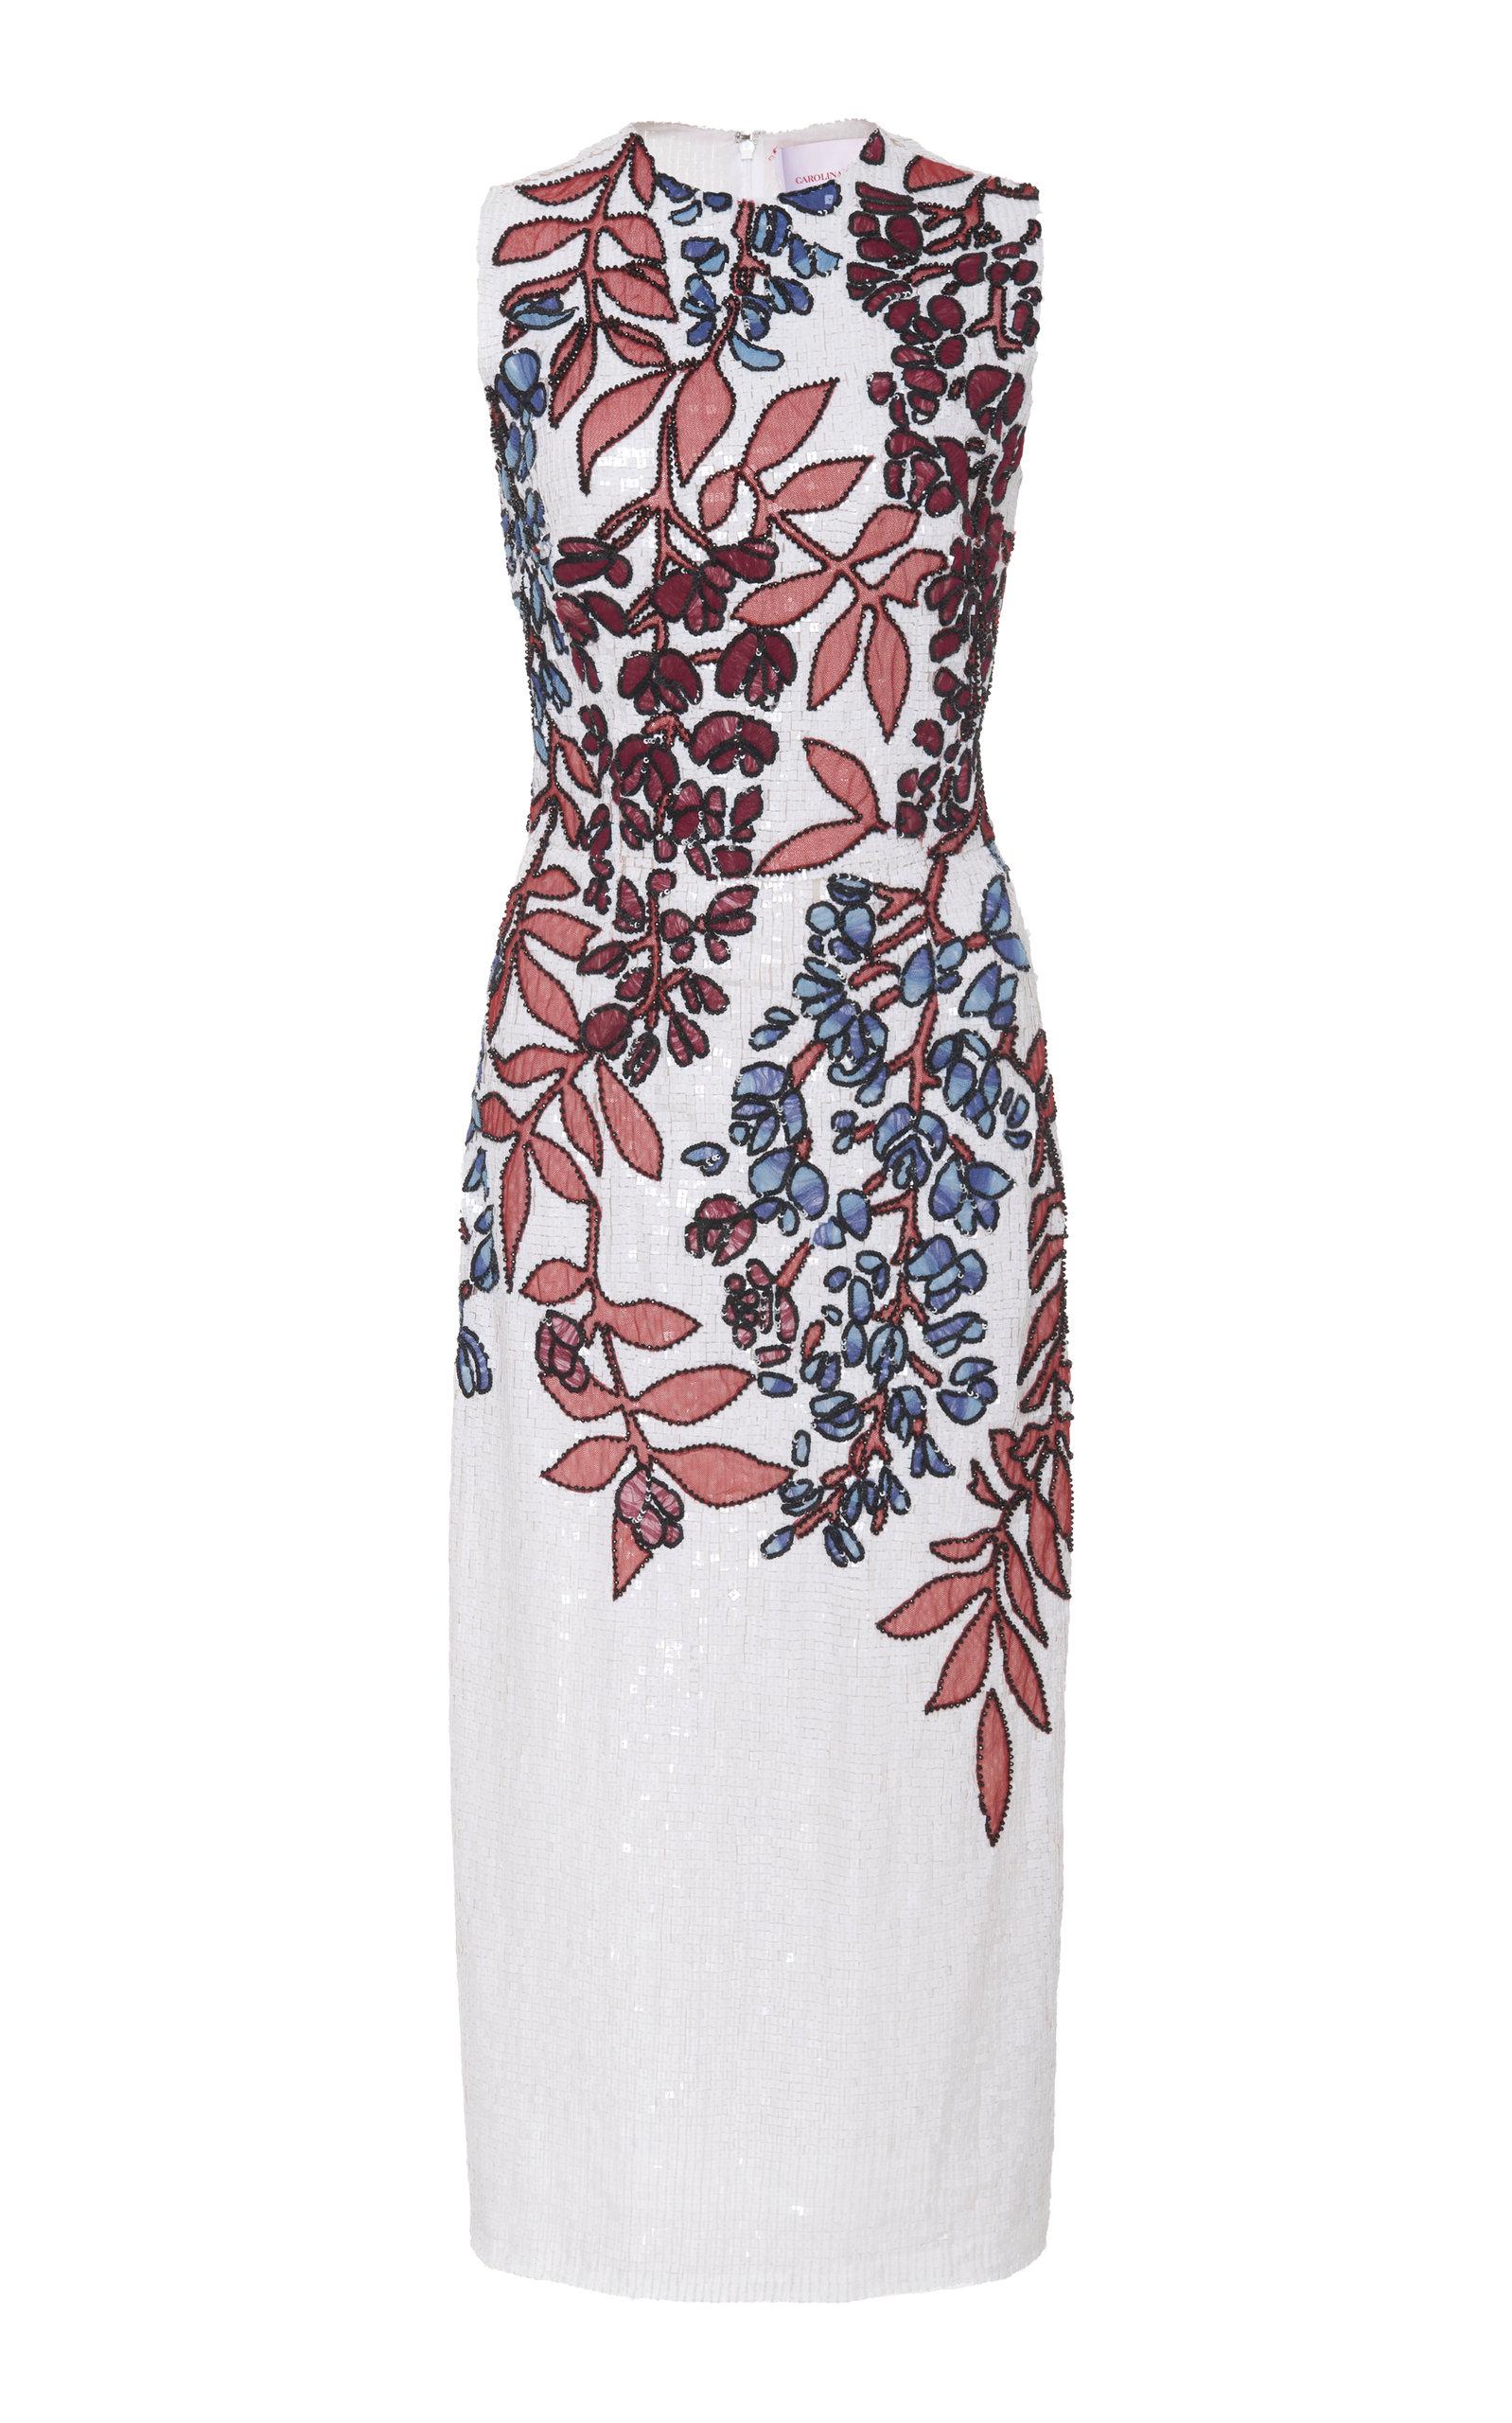 Carolina Herrera Dresses SEQUINED SILK MIDI DRESS SIZE: 10